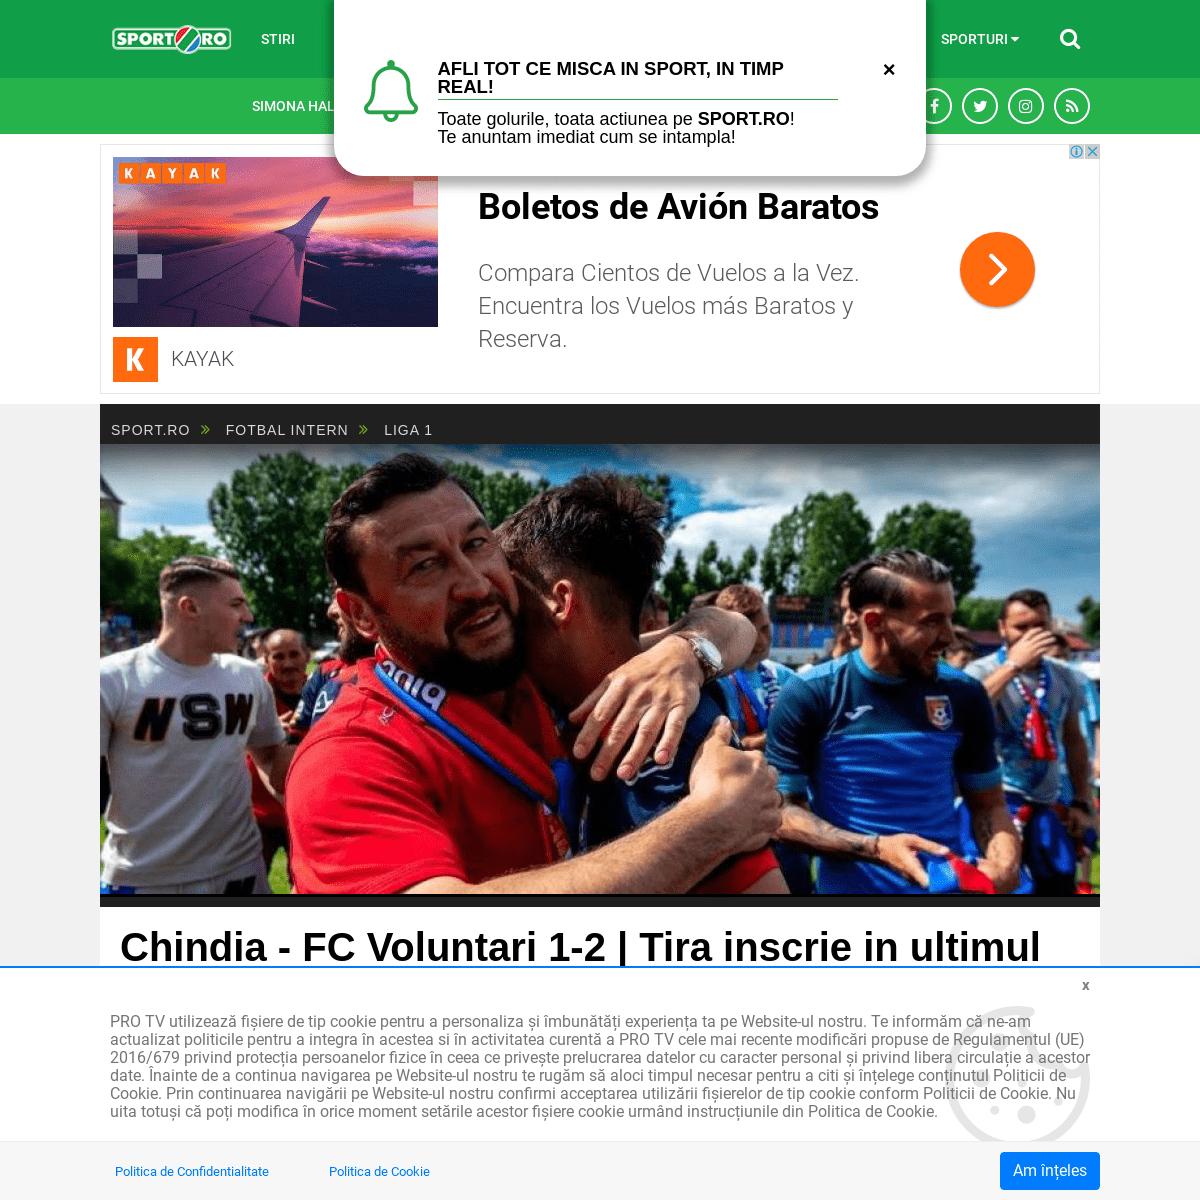 ArchiveBay.com - www.sport.ro/liga-1/chindia-fc-voluntari-live-text-de-la-17-30-meci-semnificativ-pentru-viorel-moldovan-echipele-probabile.html - Chindia - FC Voluntari 1-2 - Tira inscrie in ultimul minut si aduce 3 puncte uriase pentru echipa sa - Sport.ro